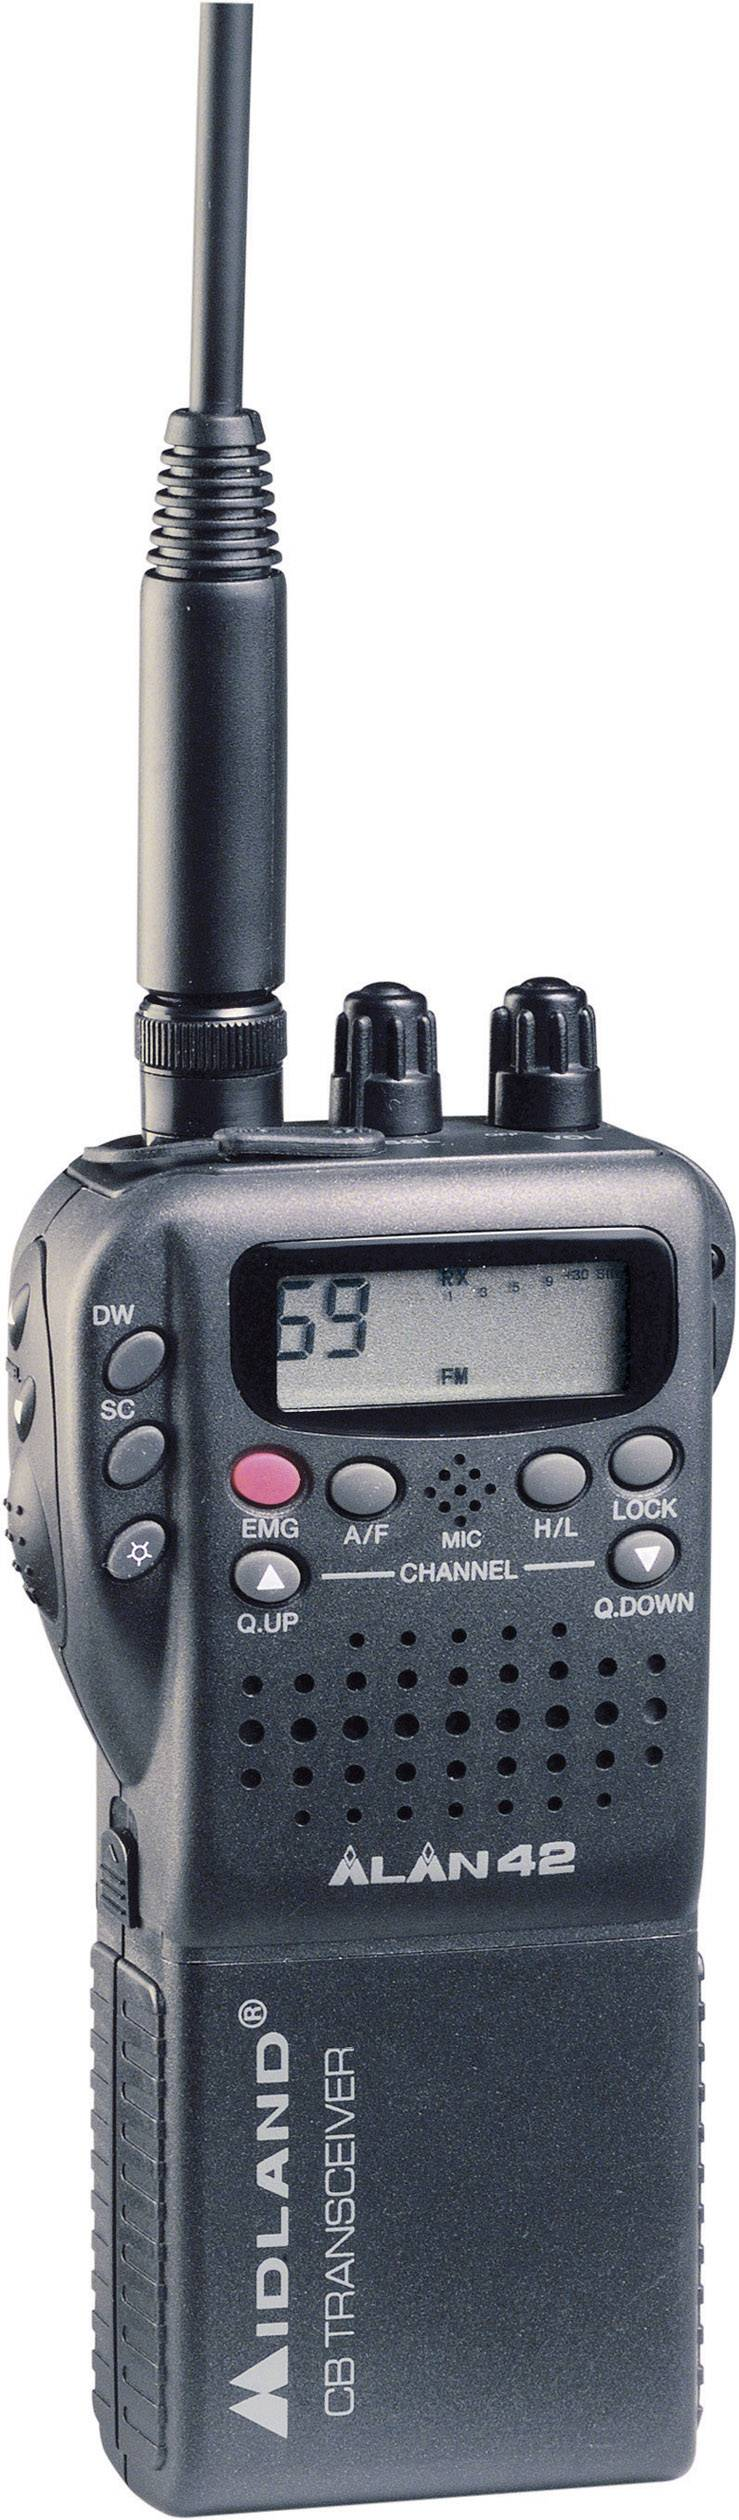 CB radiostanice Alan 42 Multistandard